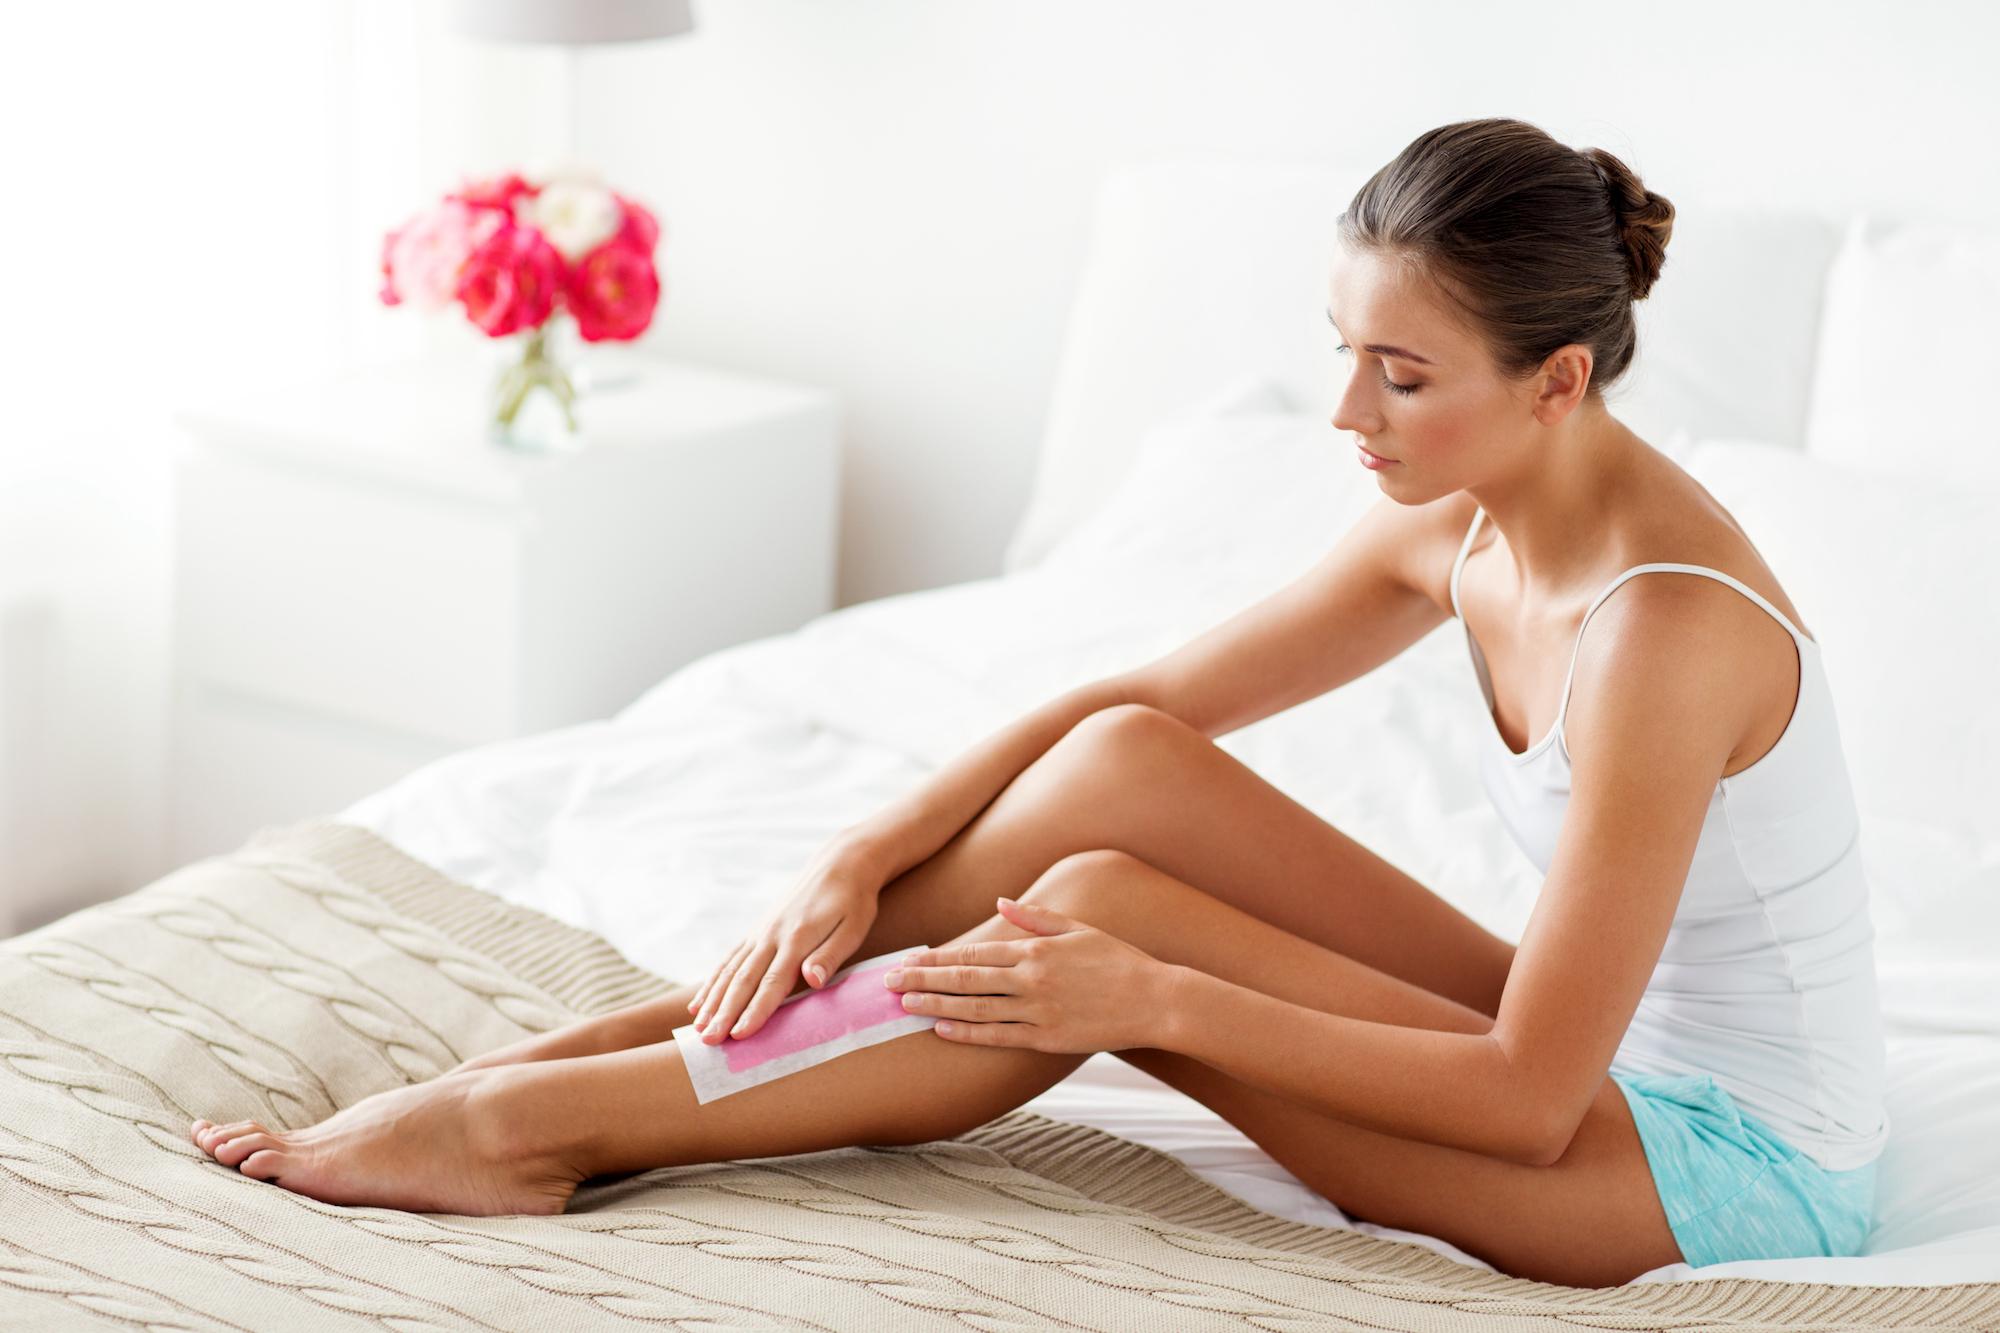 woman epilating leg hair with wax strip at home